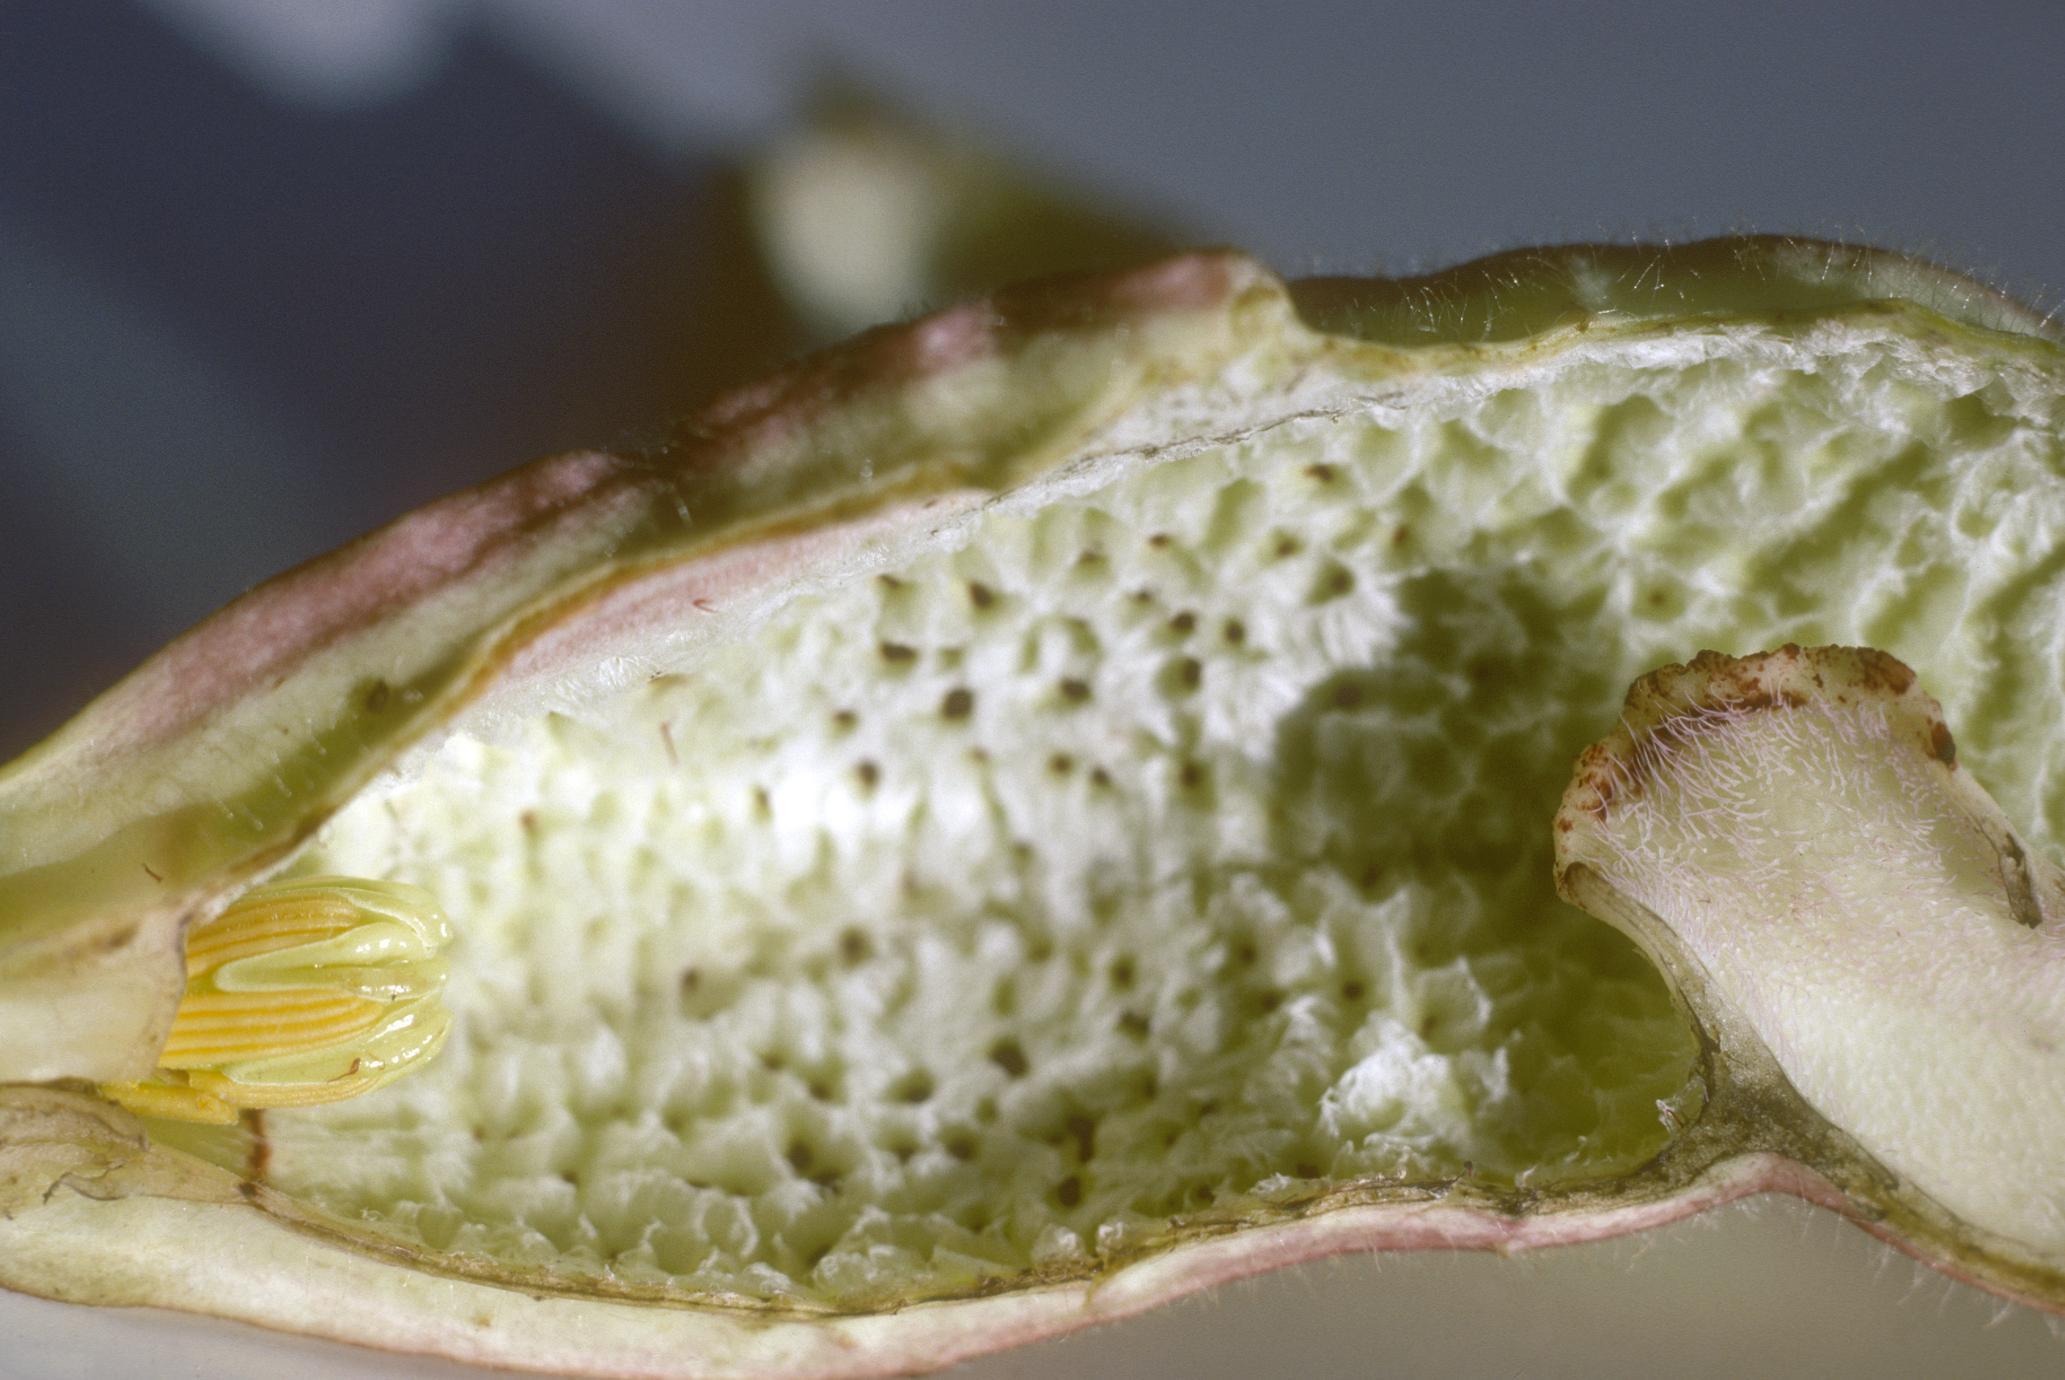 Base of inside of flower of an Aristolochia species, east of Cuilapa